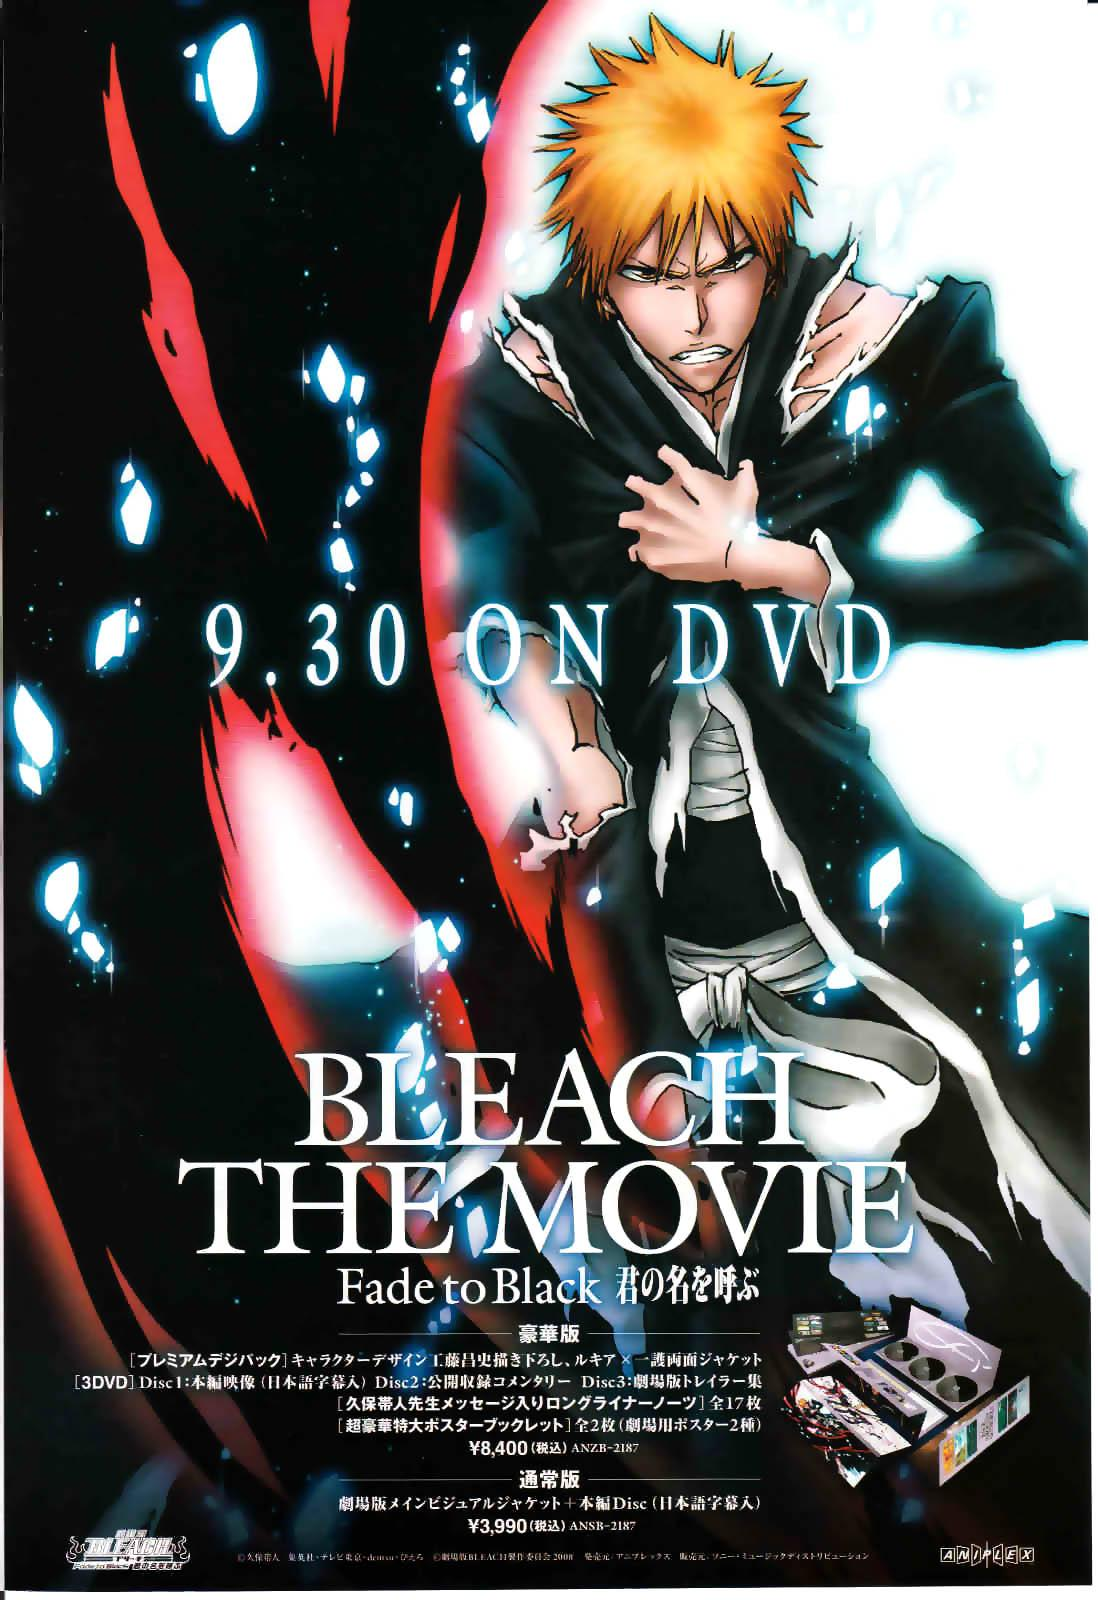 Bleach 3: Fade to Black – Kimi no na o yobu